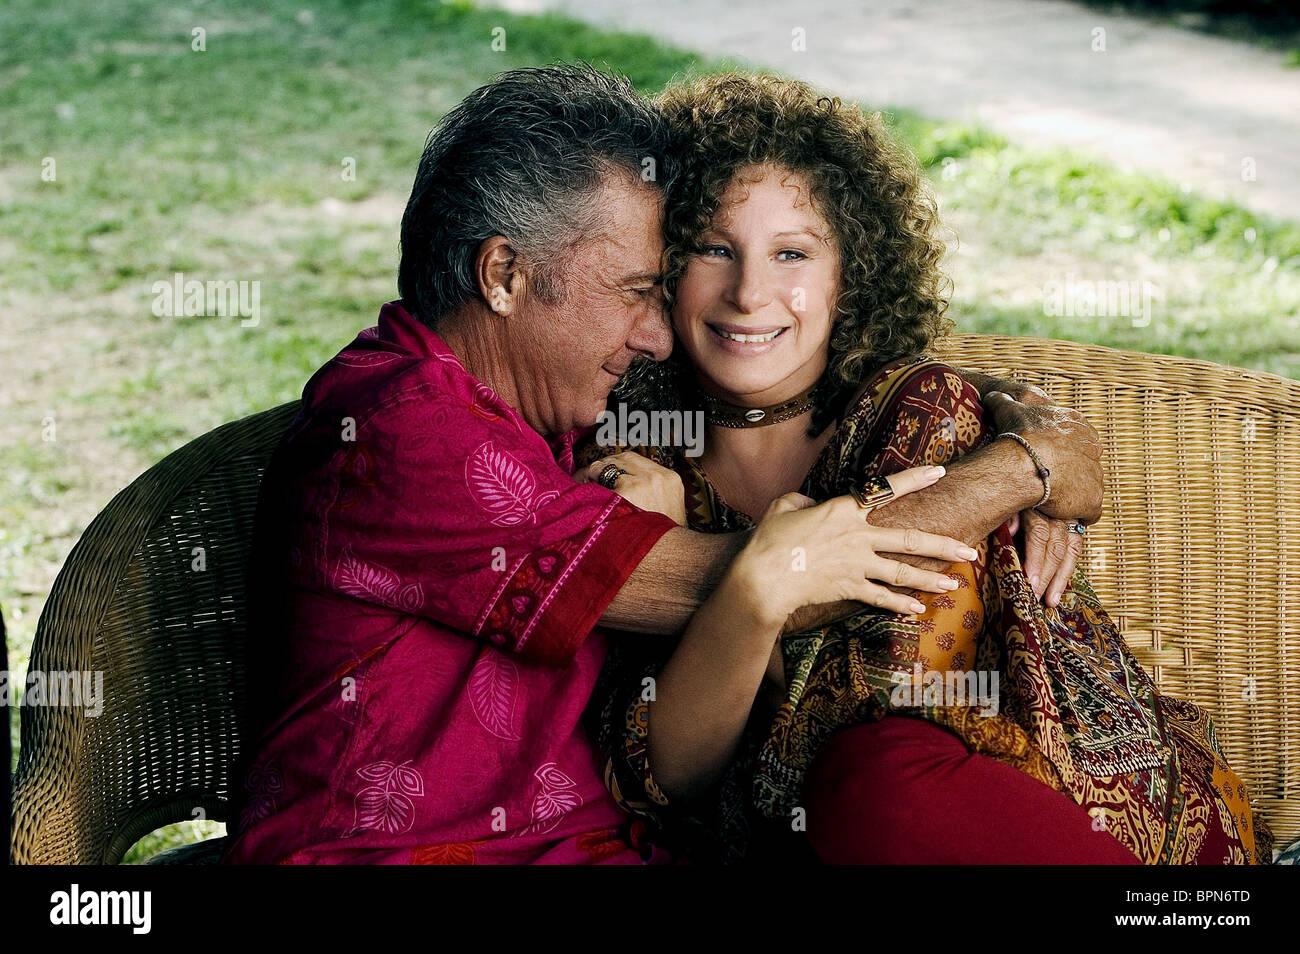 'meet The Fockers' And Barbra Stock Photos & 'meet The ... Barbra Streisand Meet The Fockers